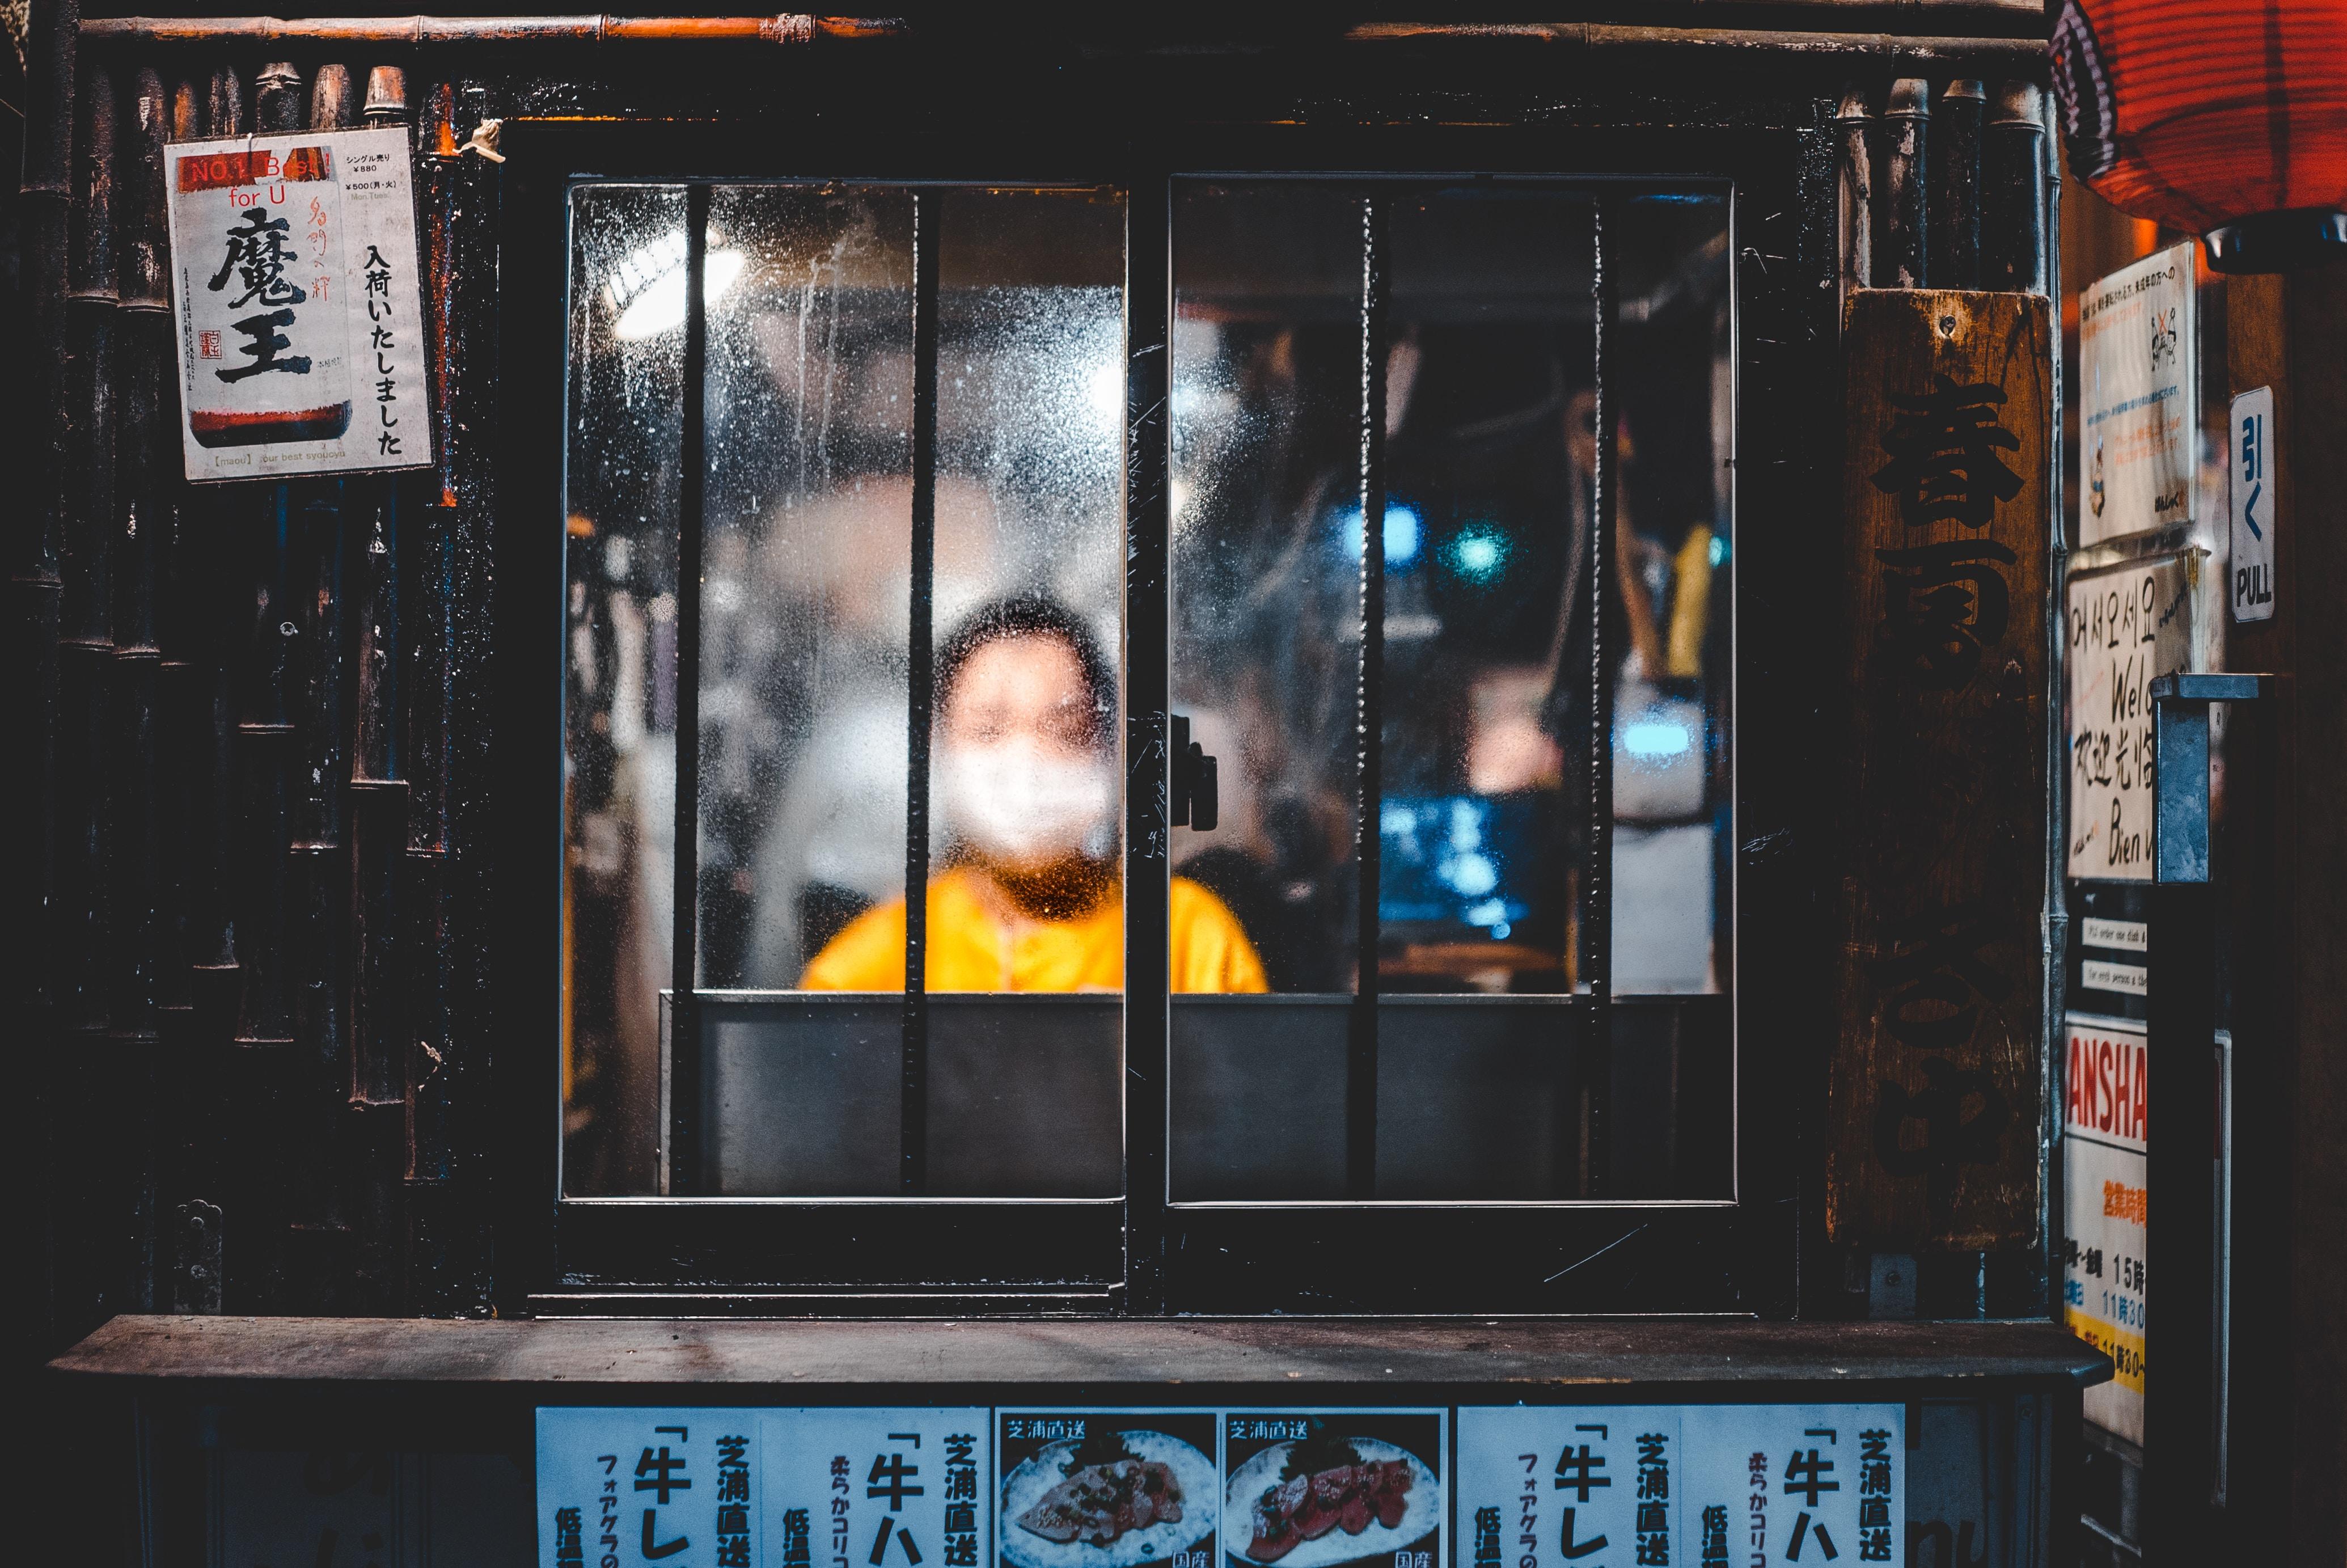 boy standing in front of window